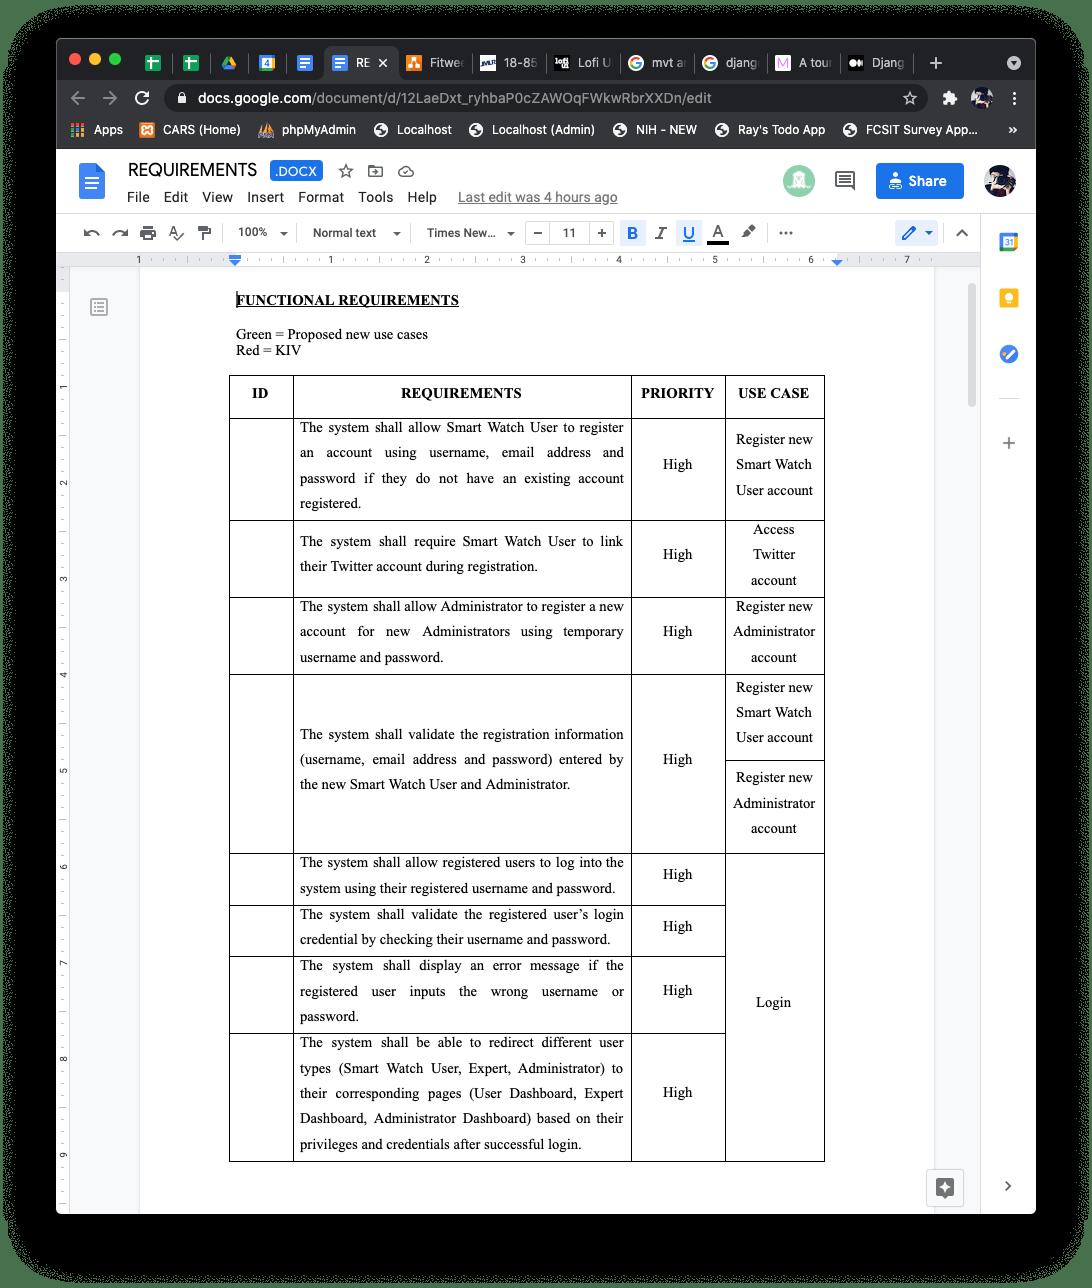 Screenshot 2021-04-04 at 8.46.52 PM.png